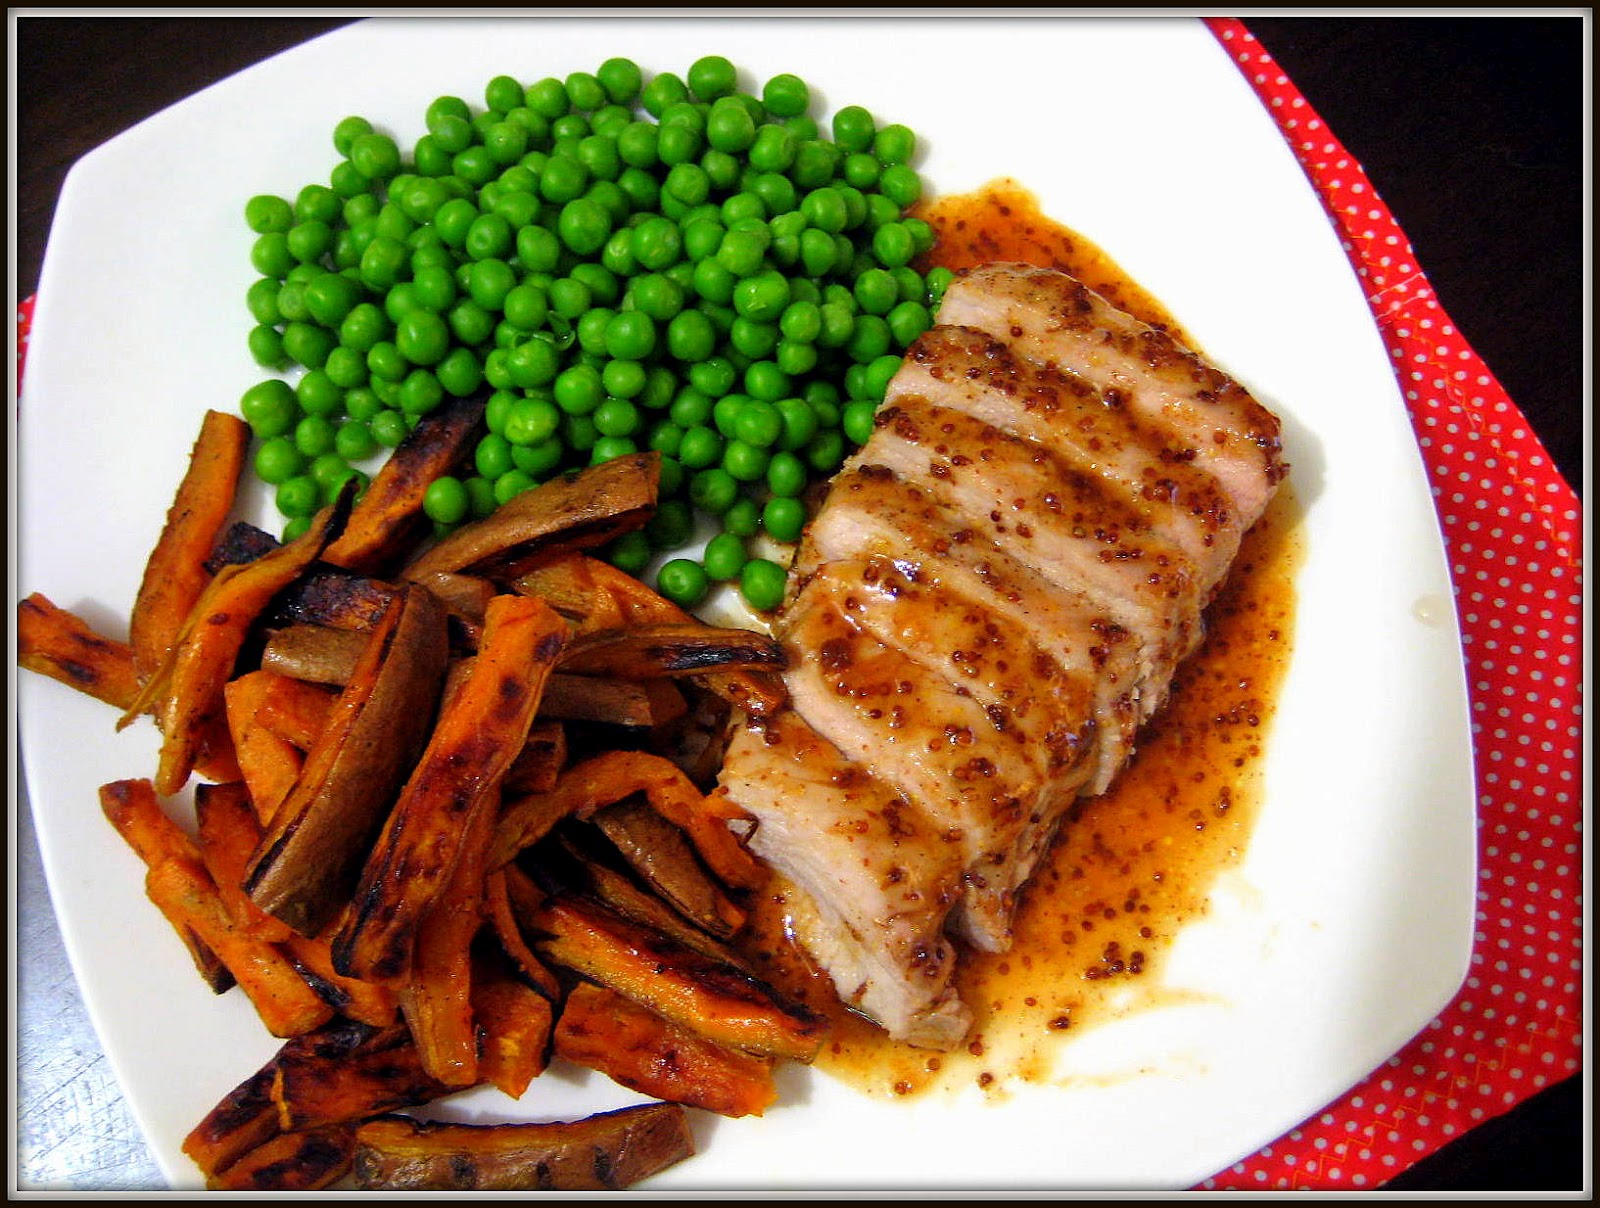 Food Tastes Yummy: ROASTED SWEET AND TANGY PORK TENDERLOIN